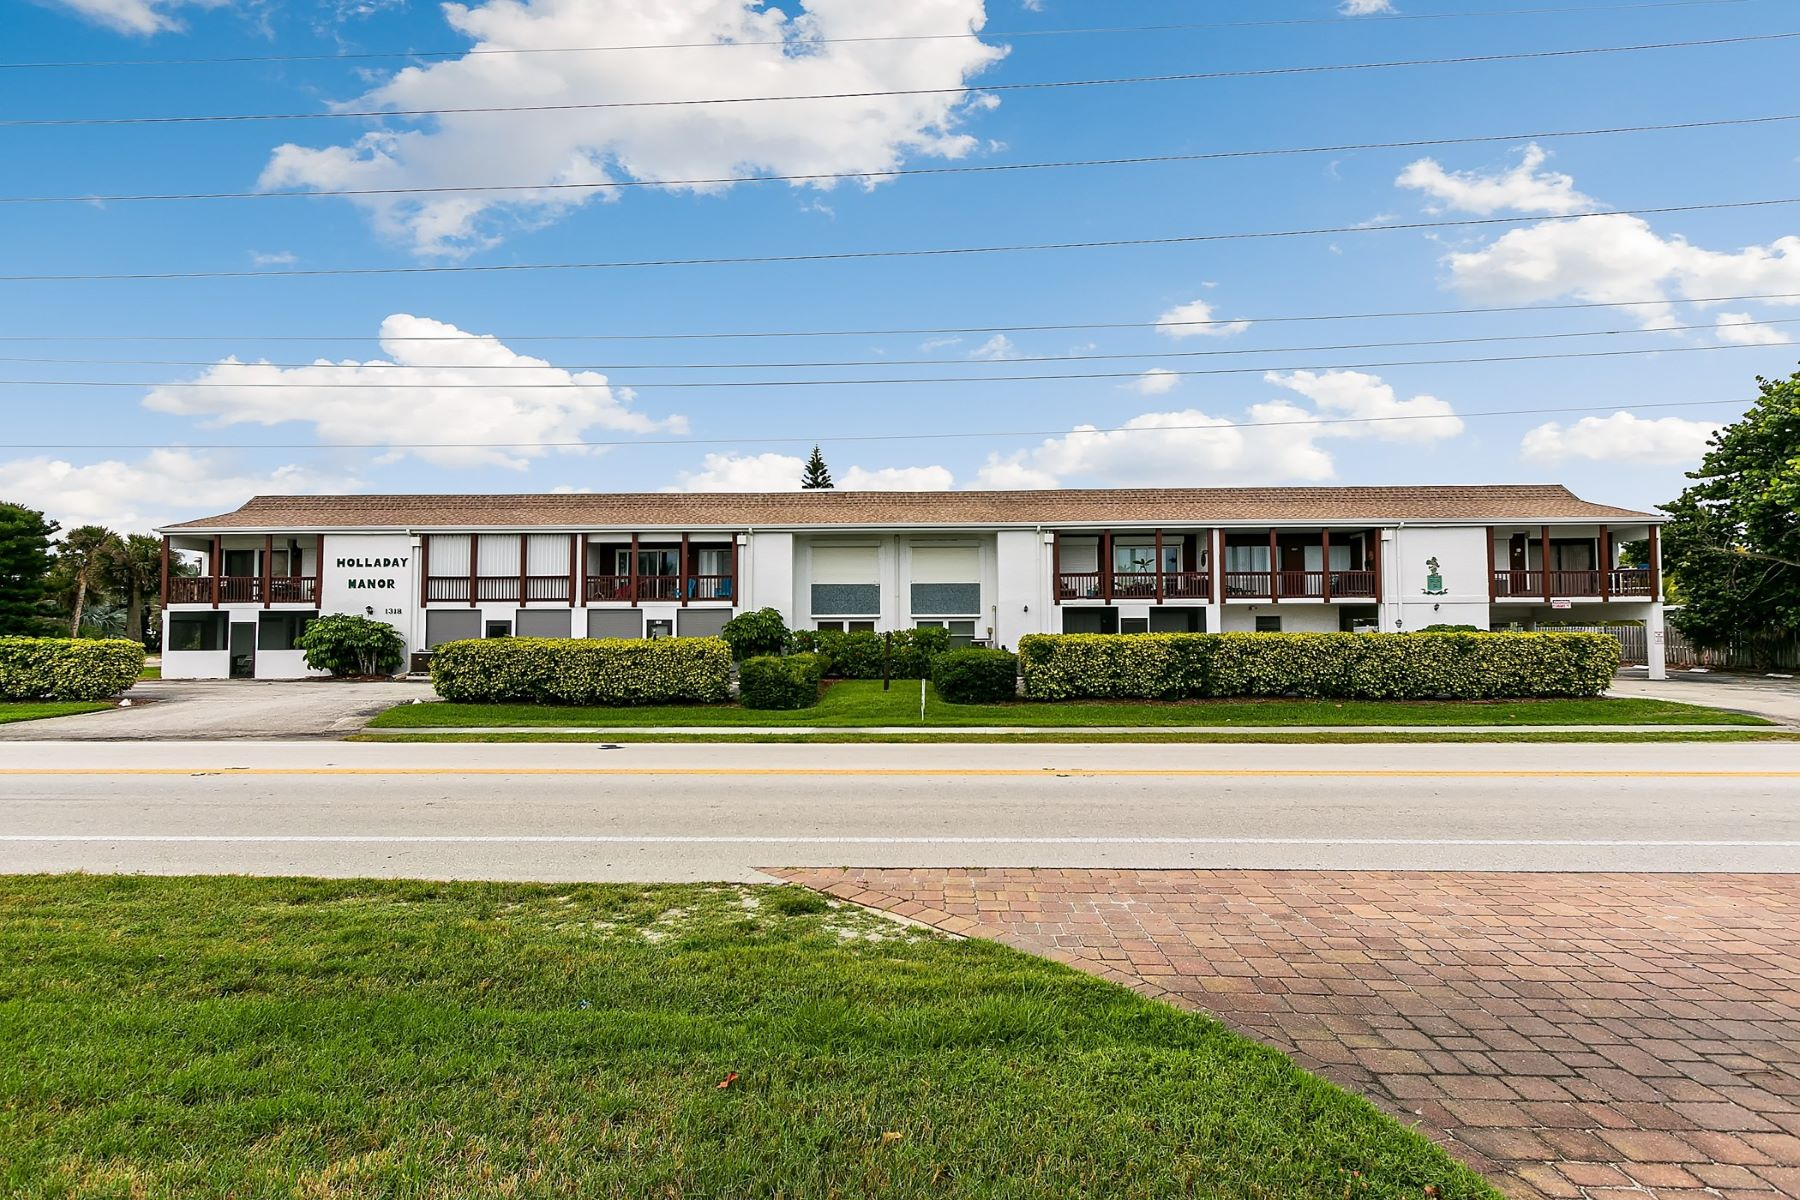 1318 S Miramar Avenue, #205, Indialantic, FL 1318 S Miramar Avenue, 205 Indialantic, Florida 32903 Hoa Kỳ